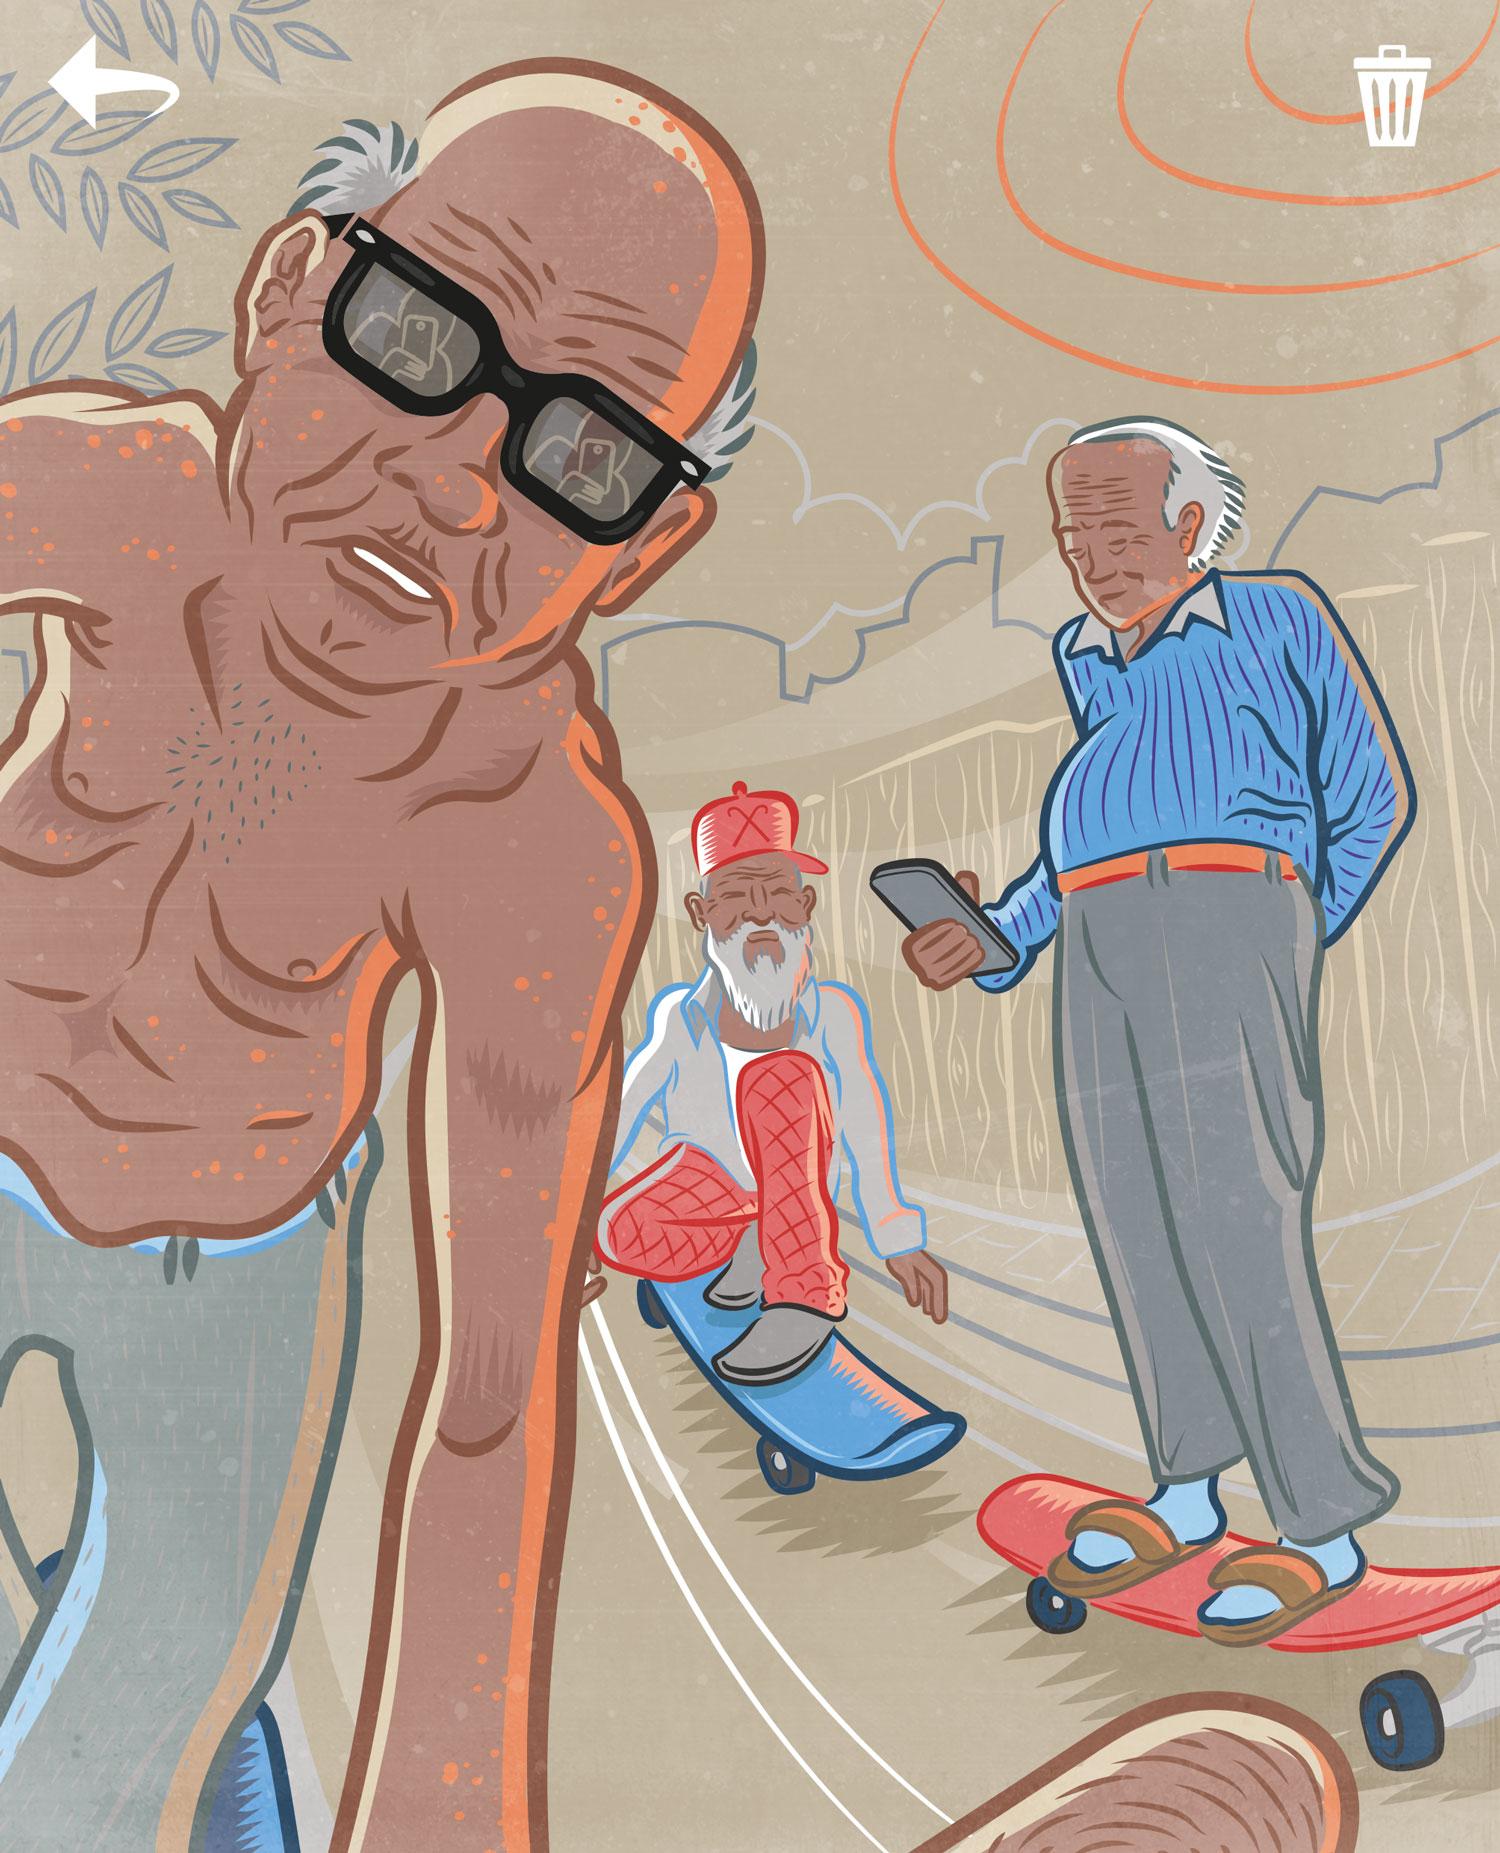 Ricky Booms Illustratie Clou 72 Vijftigplusser als marketingdoelgroep